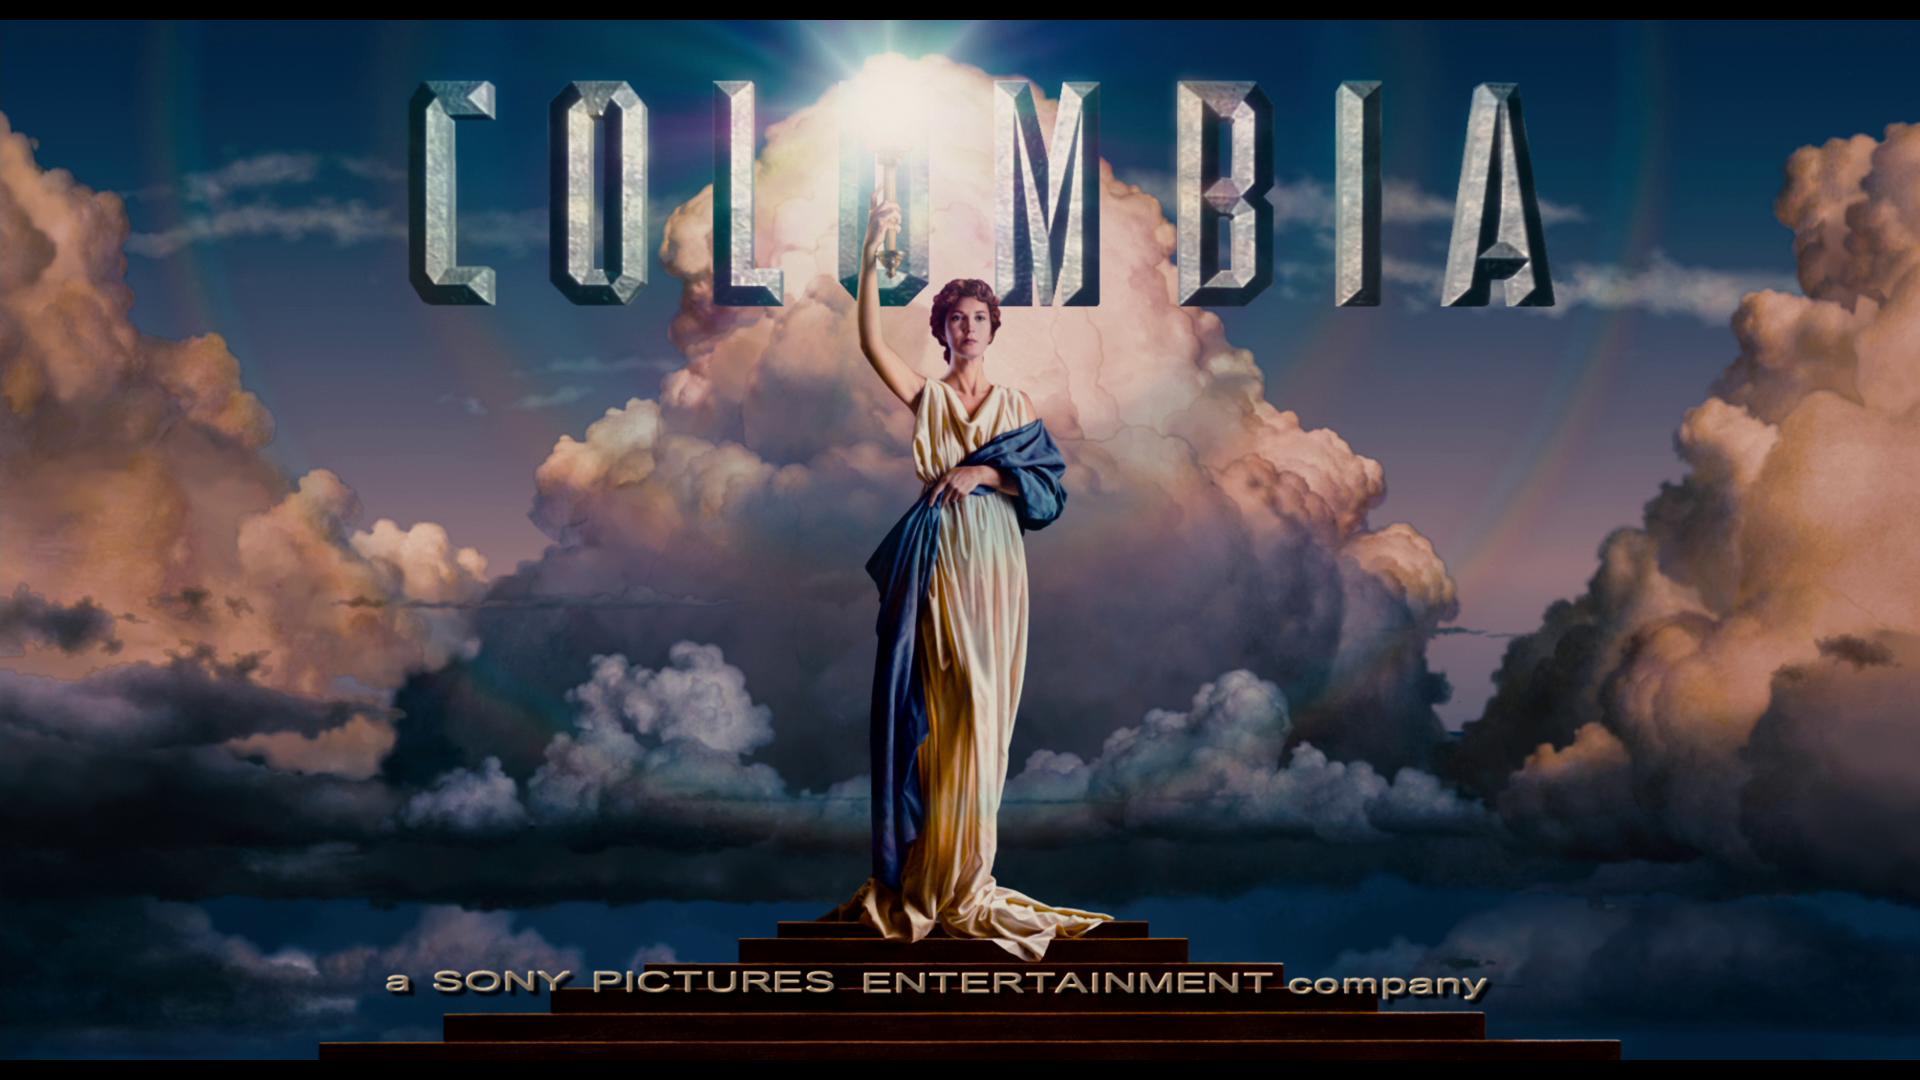 Фильмы коламбия пикчерз 2013